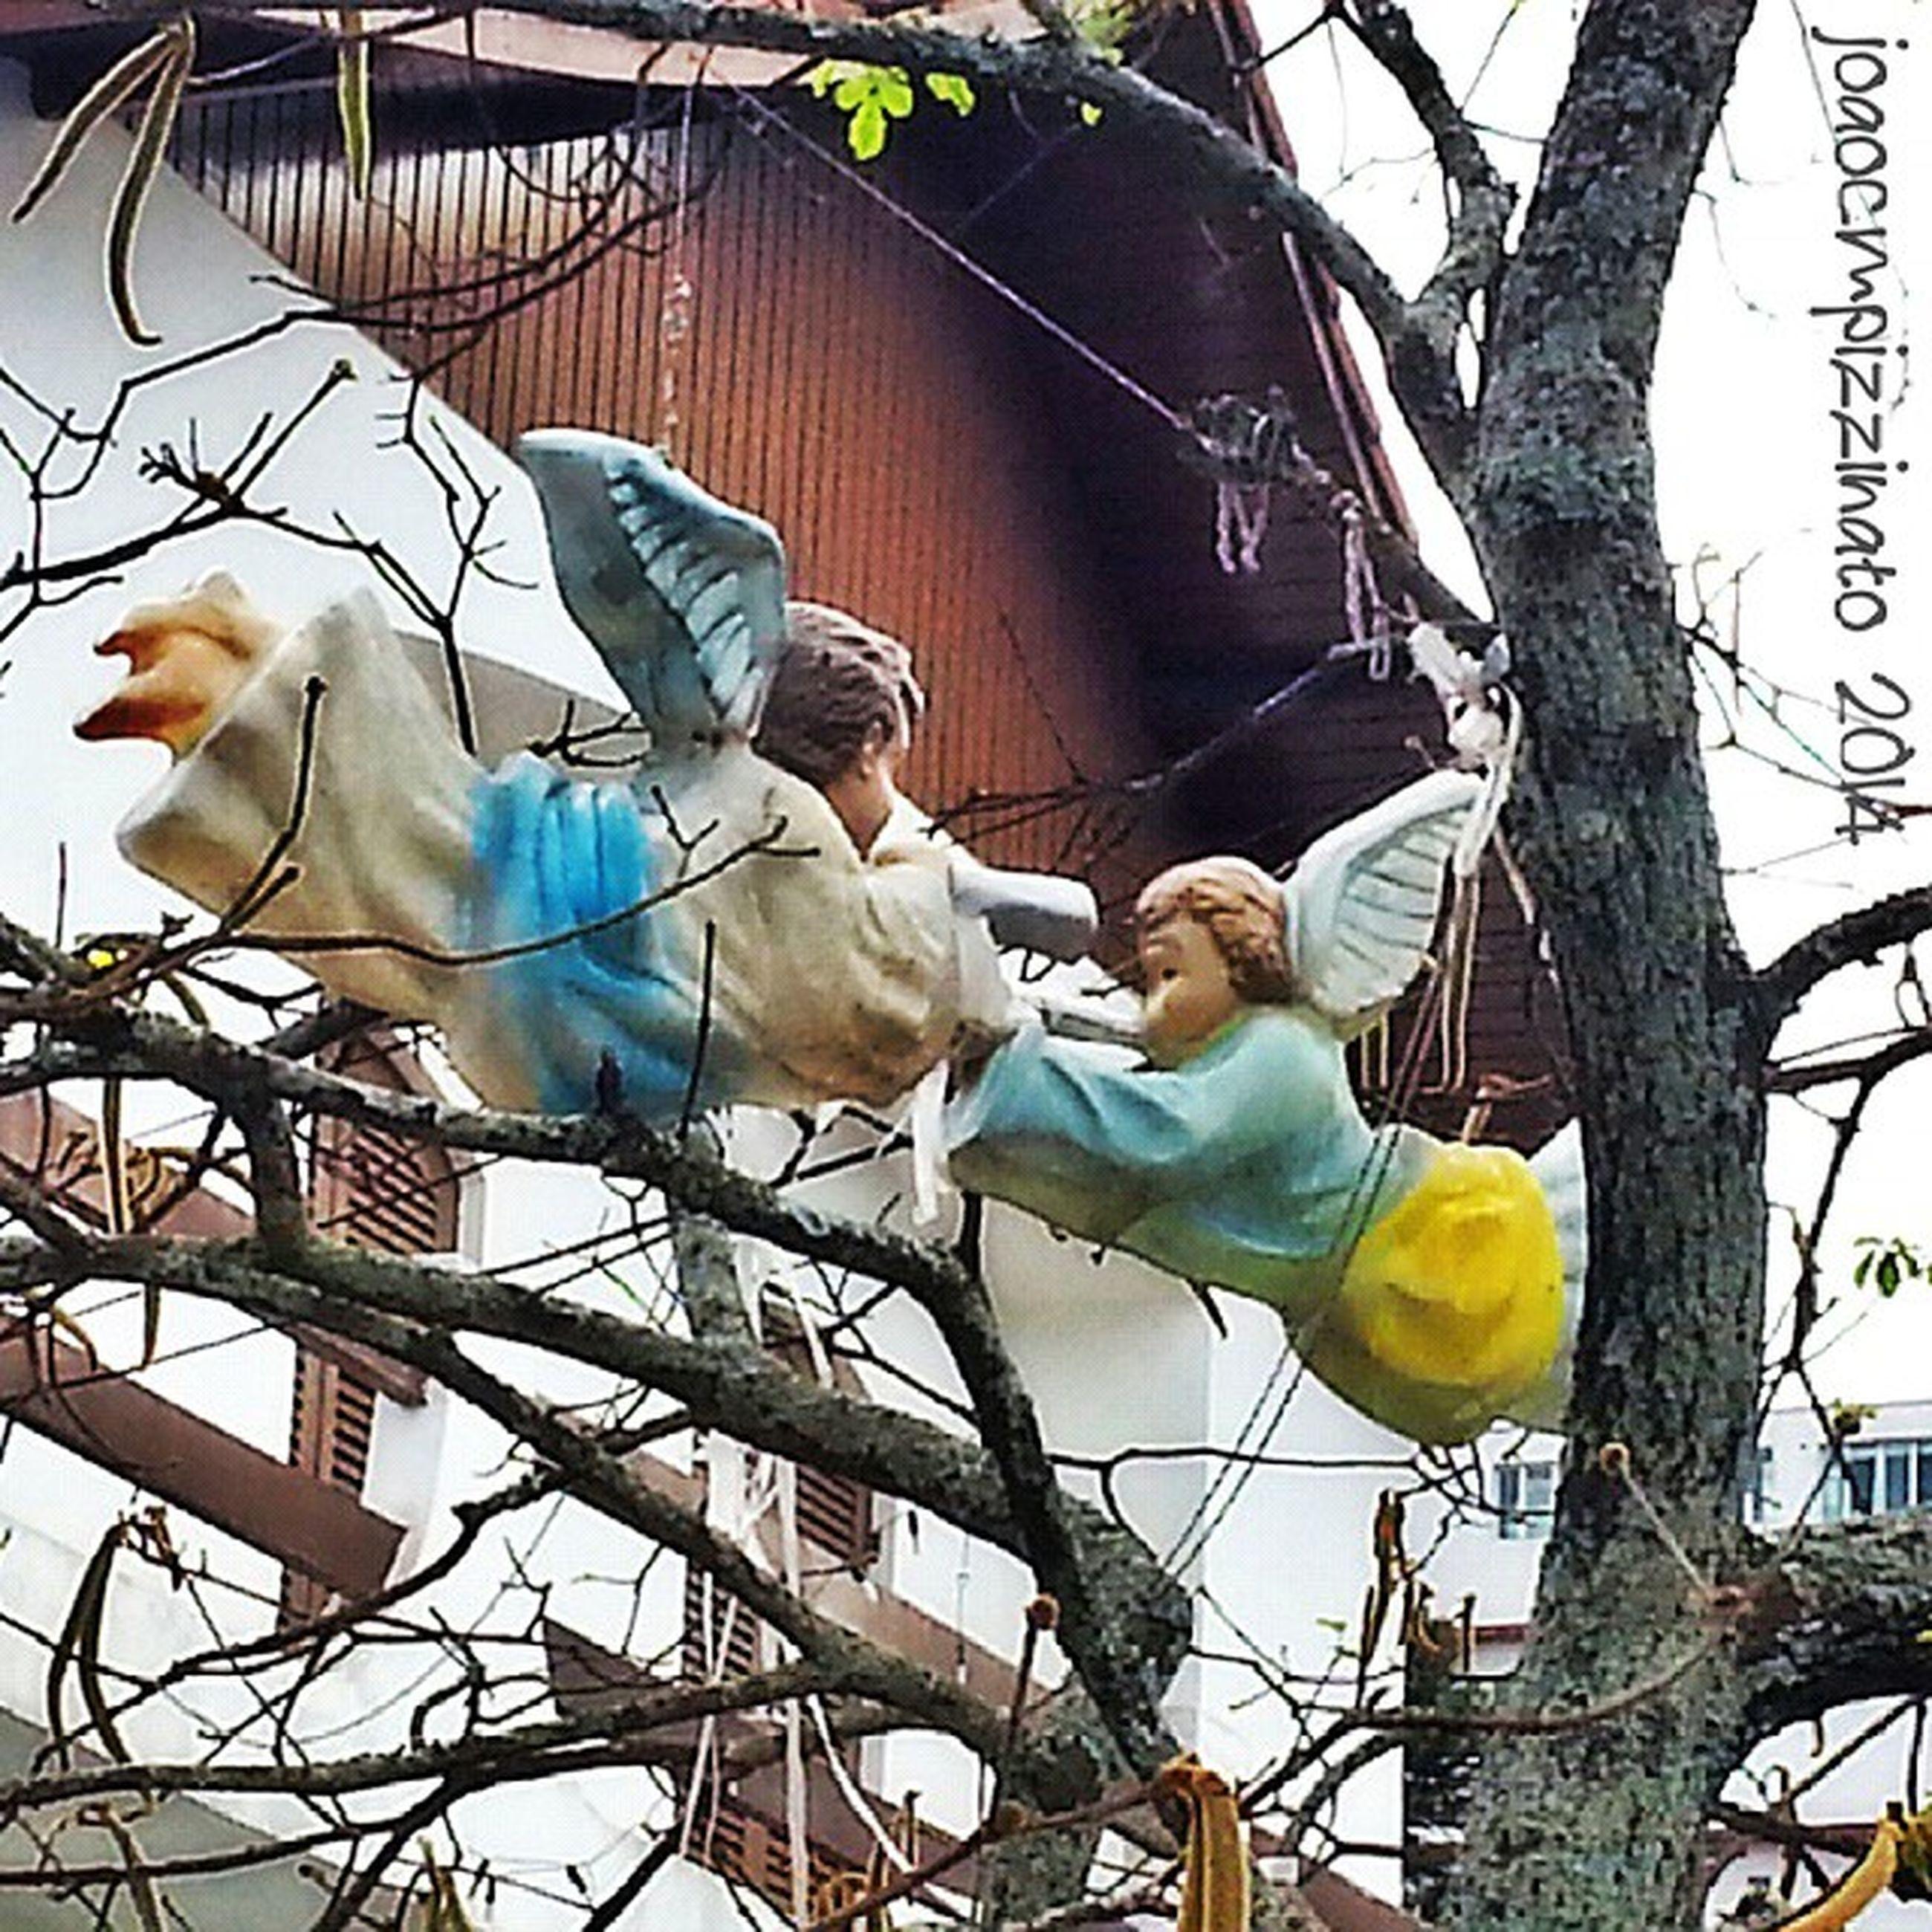 Angels. Angel Art Colors Streetphotography urban neighborhood city zonasul saopaulo brasil photography masters_of_darkness